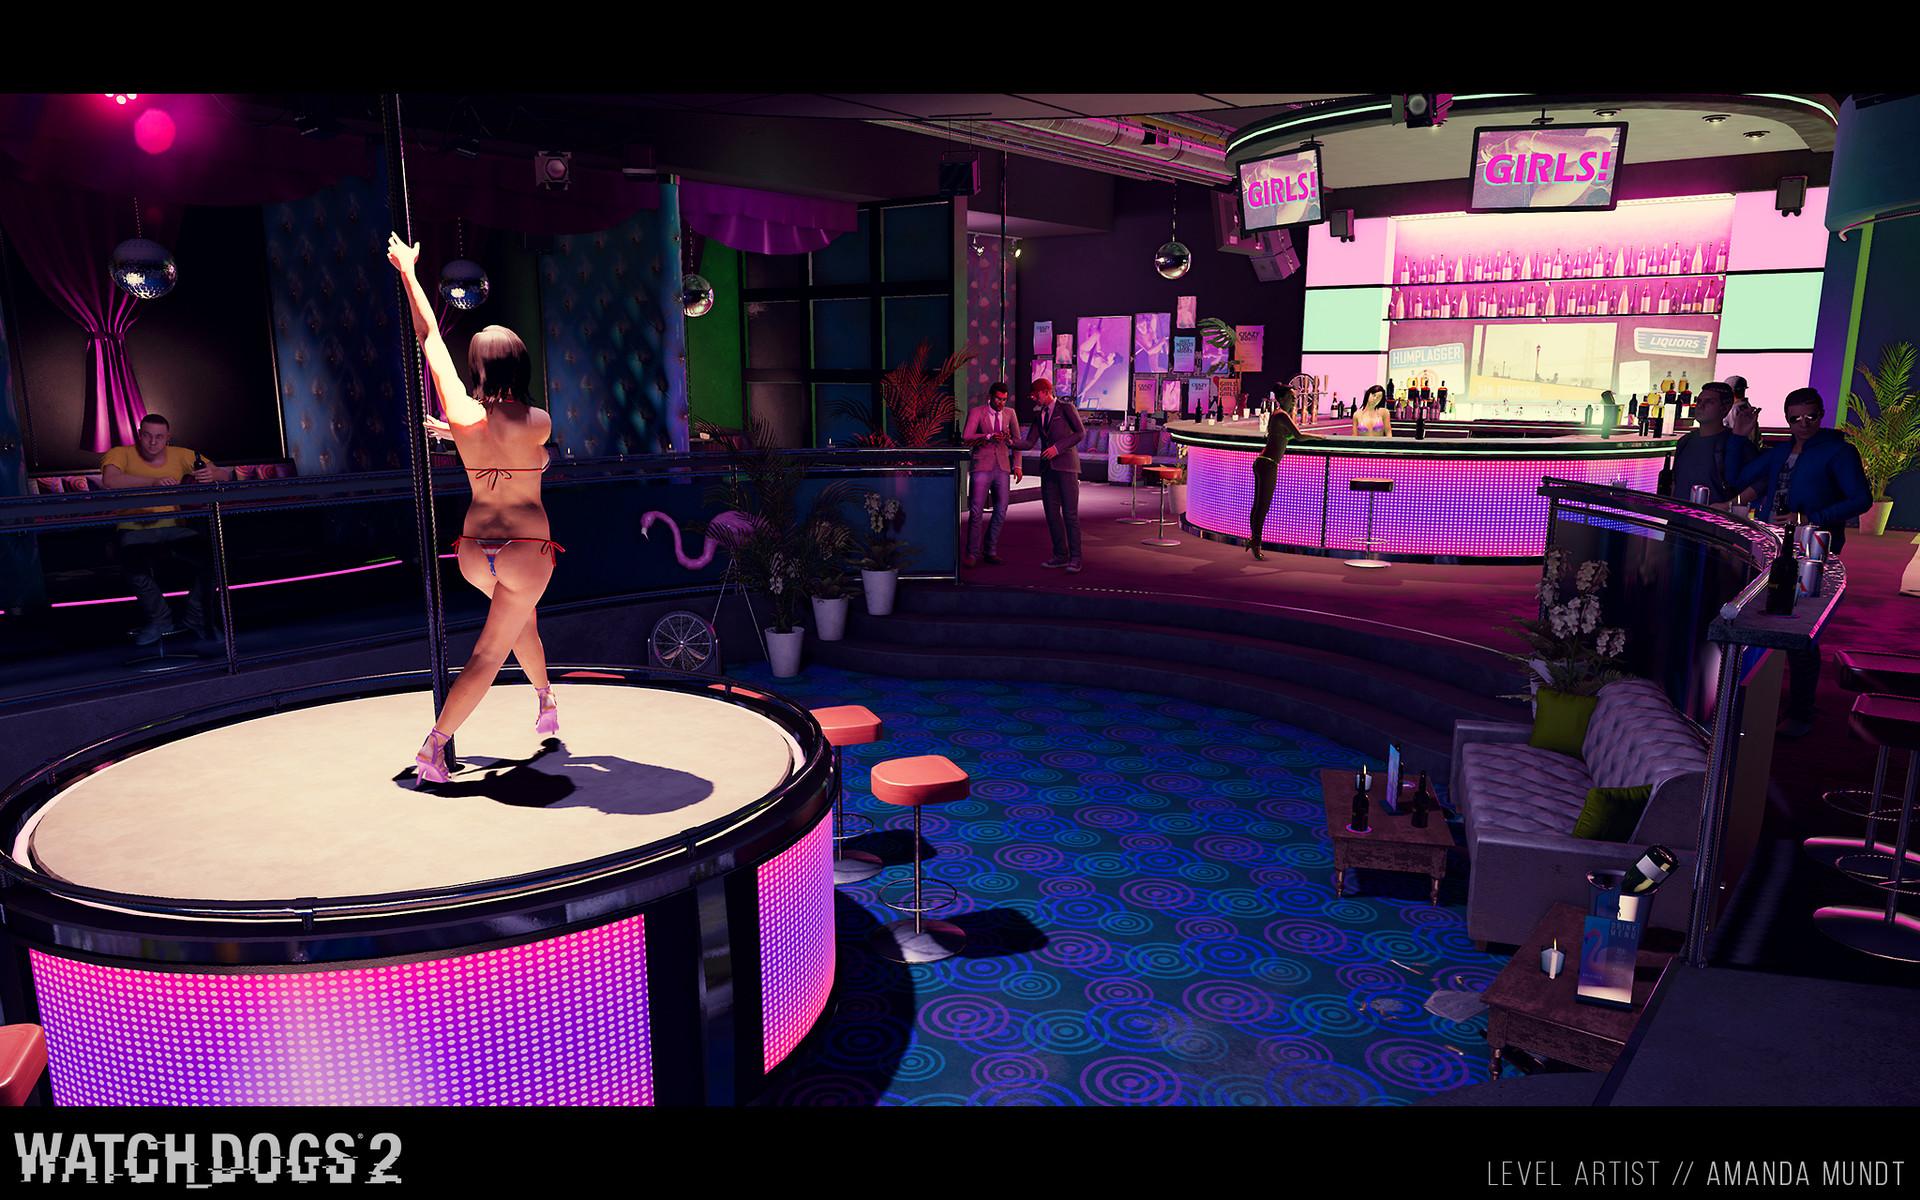 Amanda Mundt Watch Dogs 2 Bar Interiors